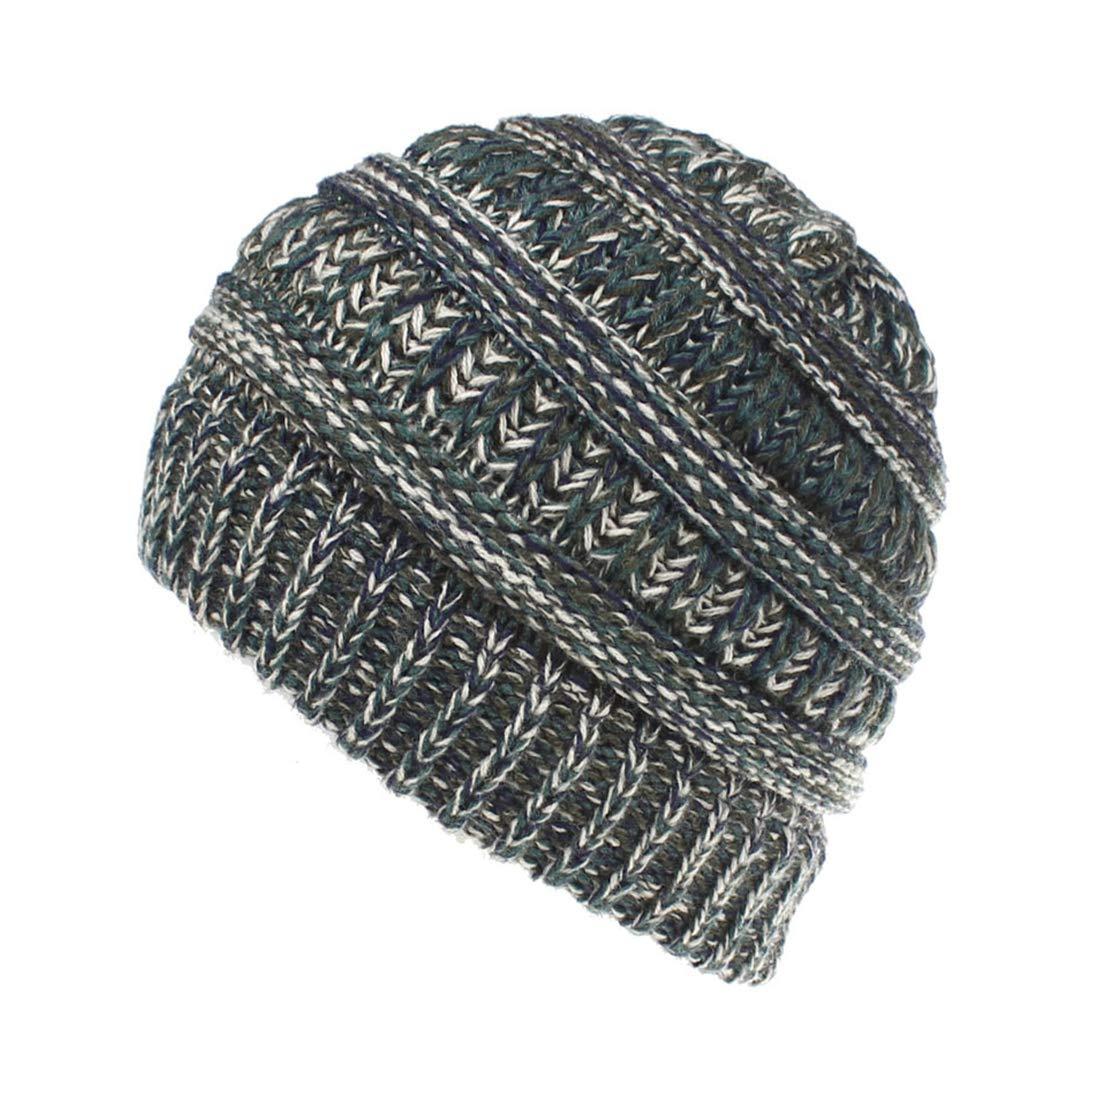 Classic Kids Toddler Chunky Knit Warm Winter Hat Beanie Skull Cap for Children